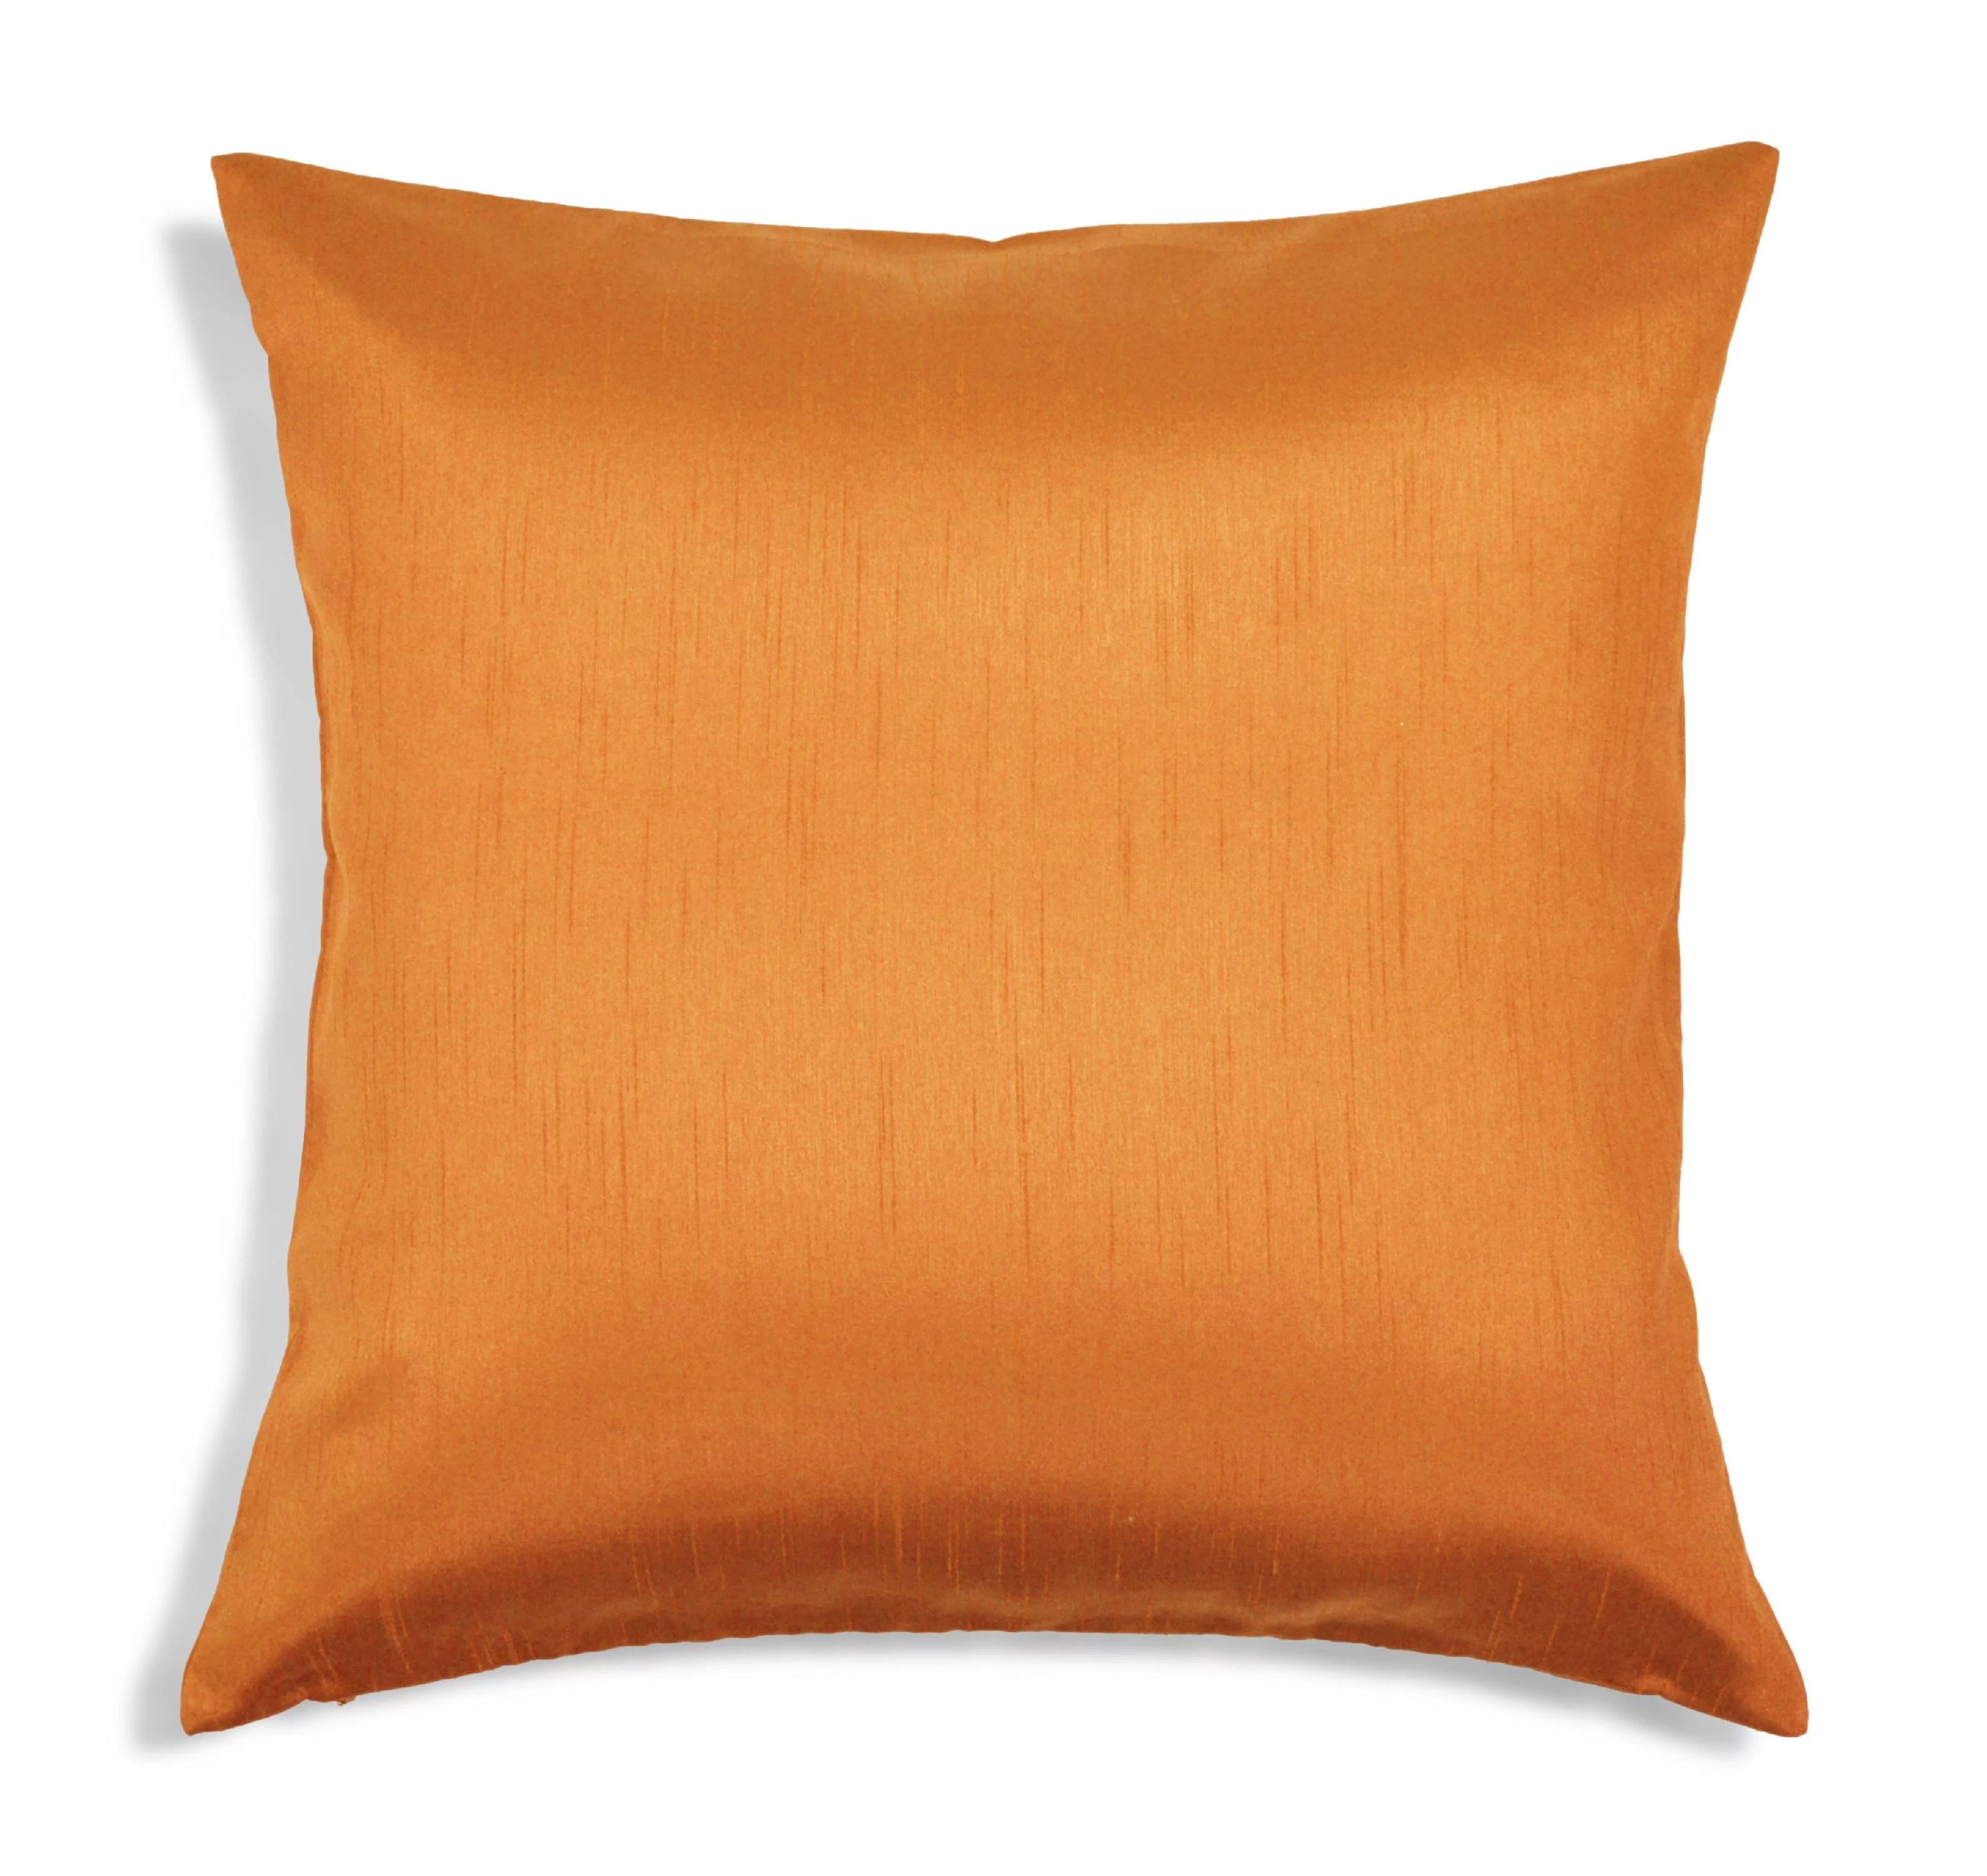 aiking home solid faux silk euro sham pillow cover 26 by 26 orange walmart com